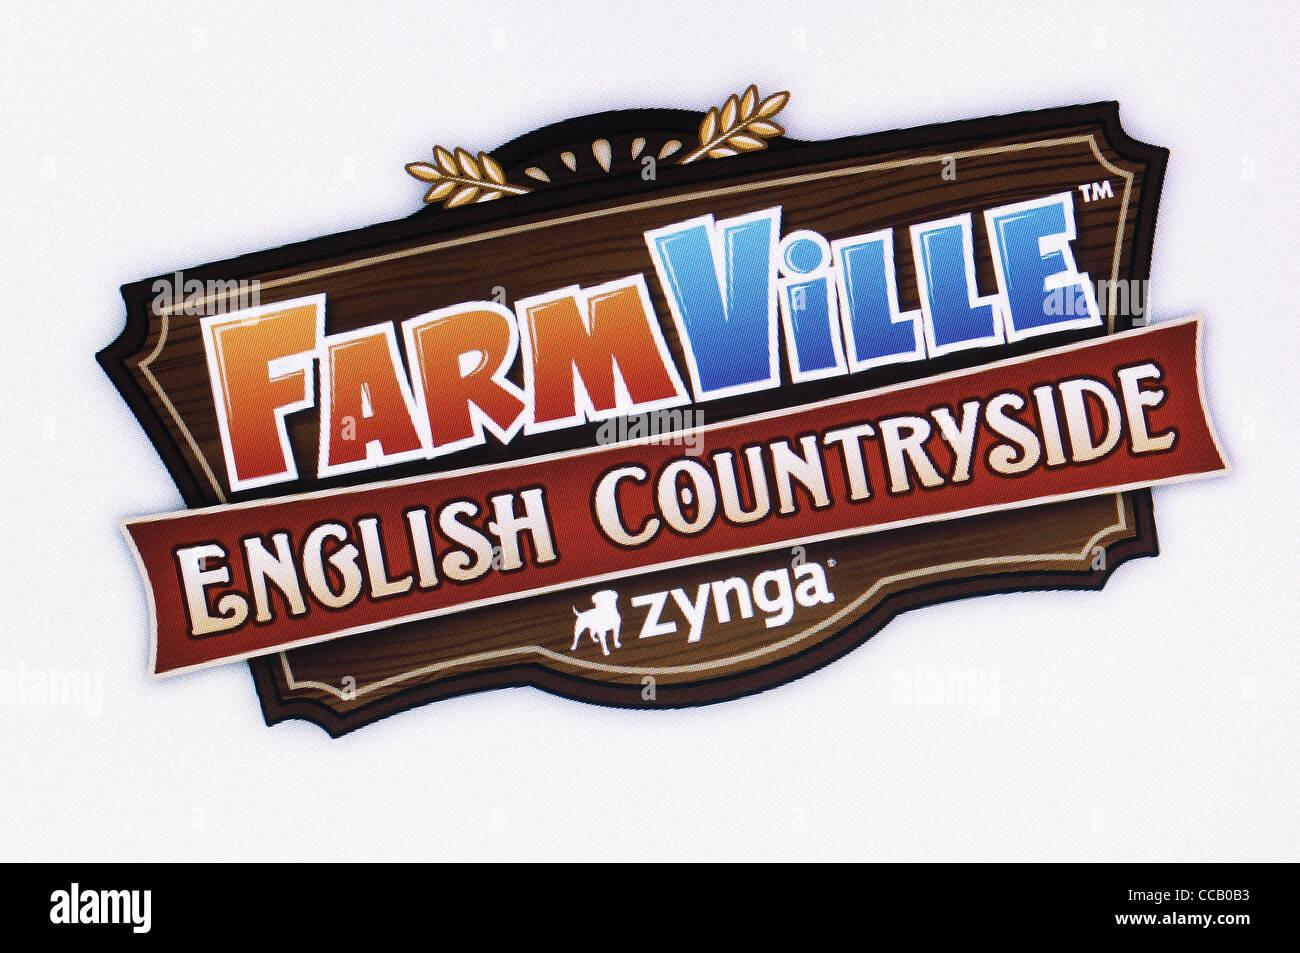 Farmville English Countryside Screenshot. The Farming Simulation Social Network Game by Zynga. - Stock Image